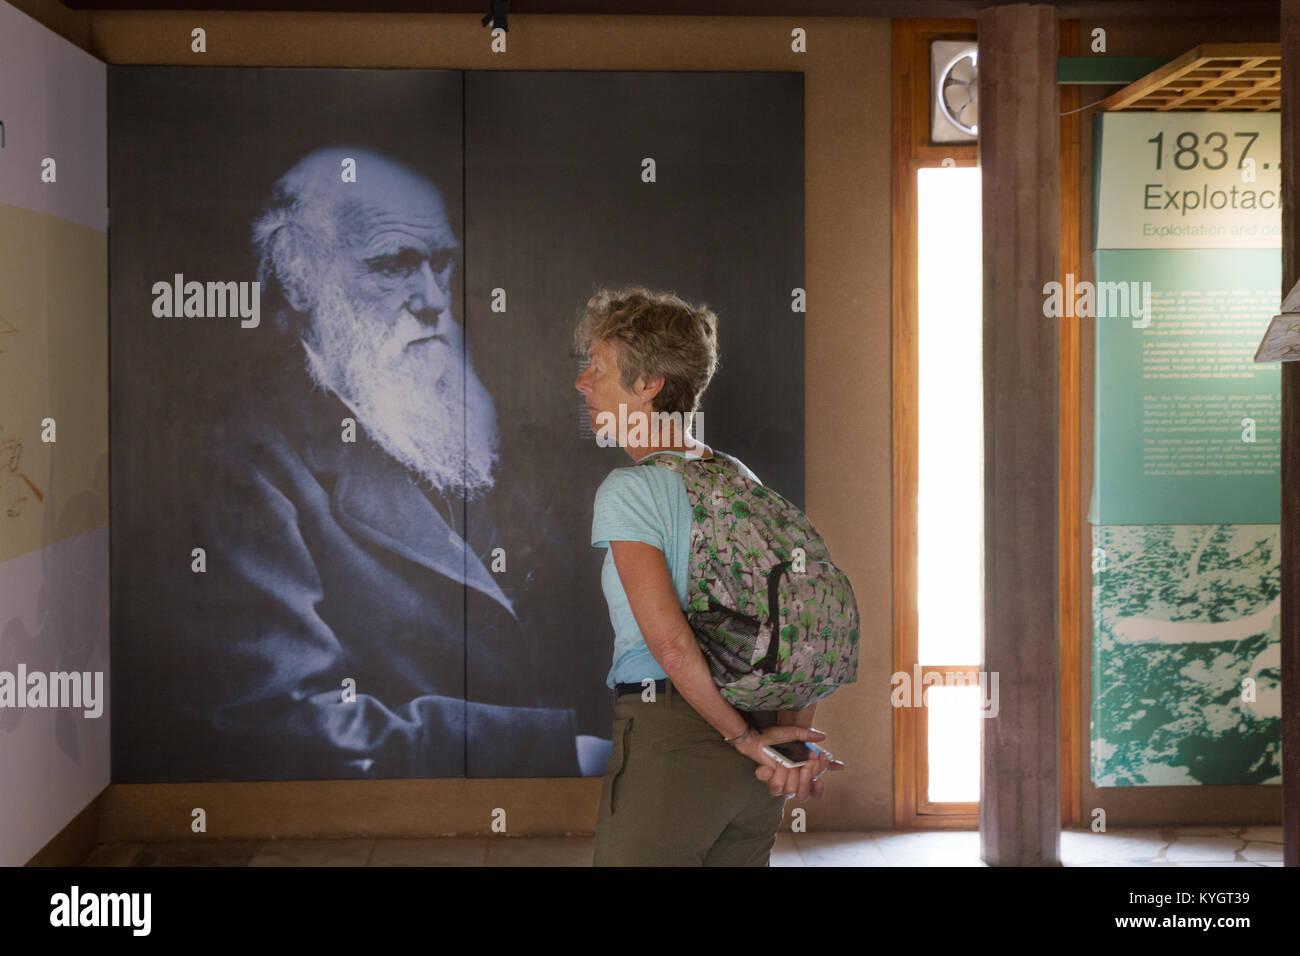 A tourist and an image of Charles Darwin; The Interpretation Centre ( aka Galapagos Science centre ), San Cristobal - Stock Image